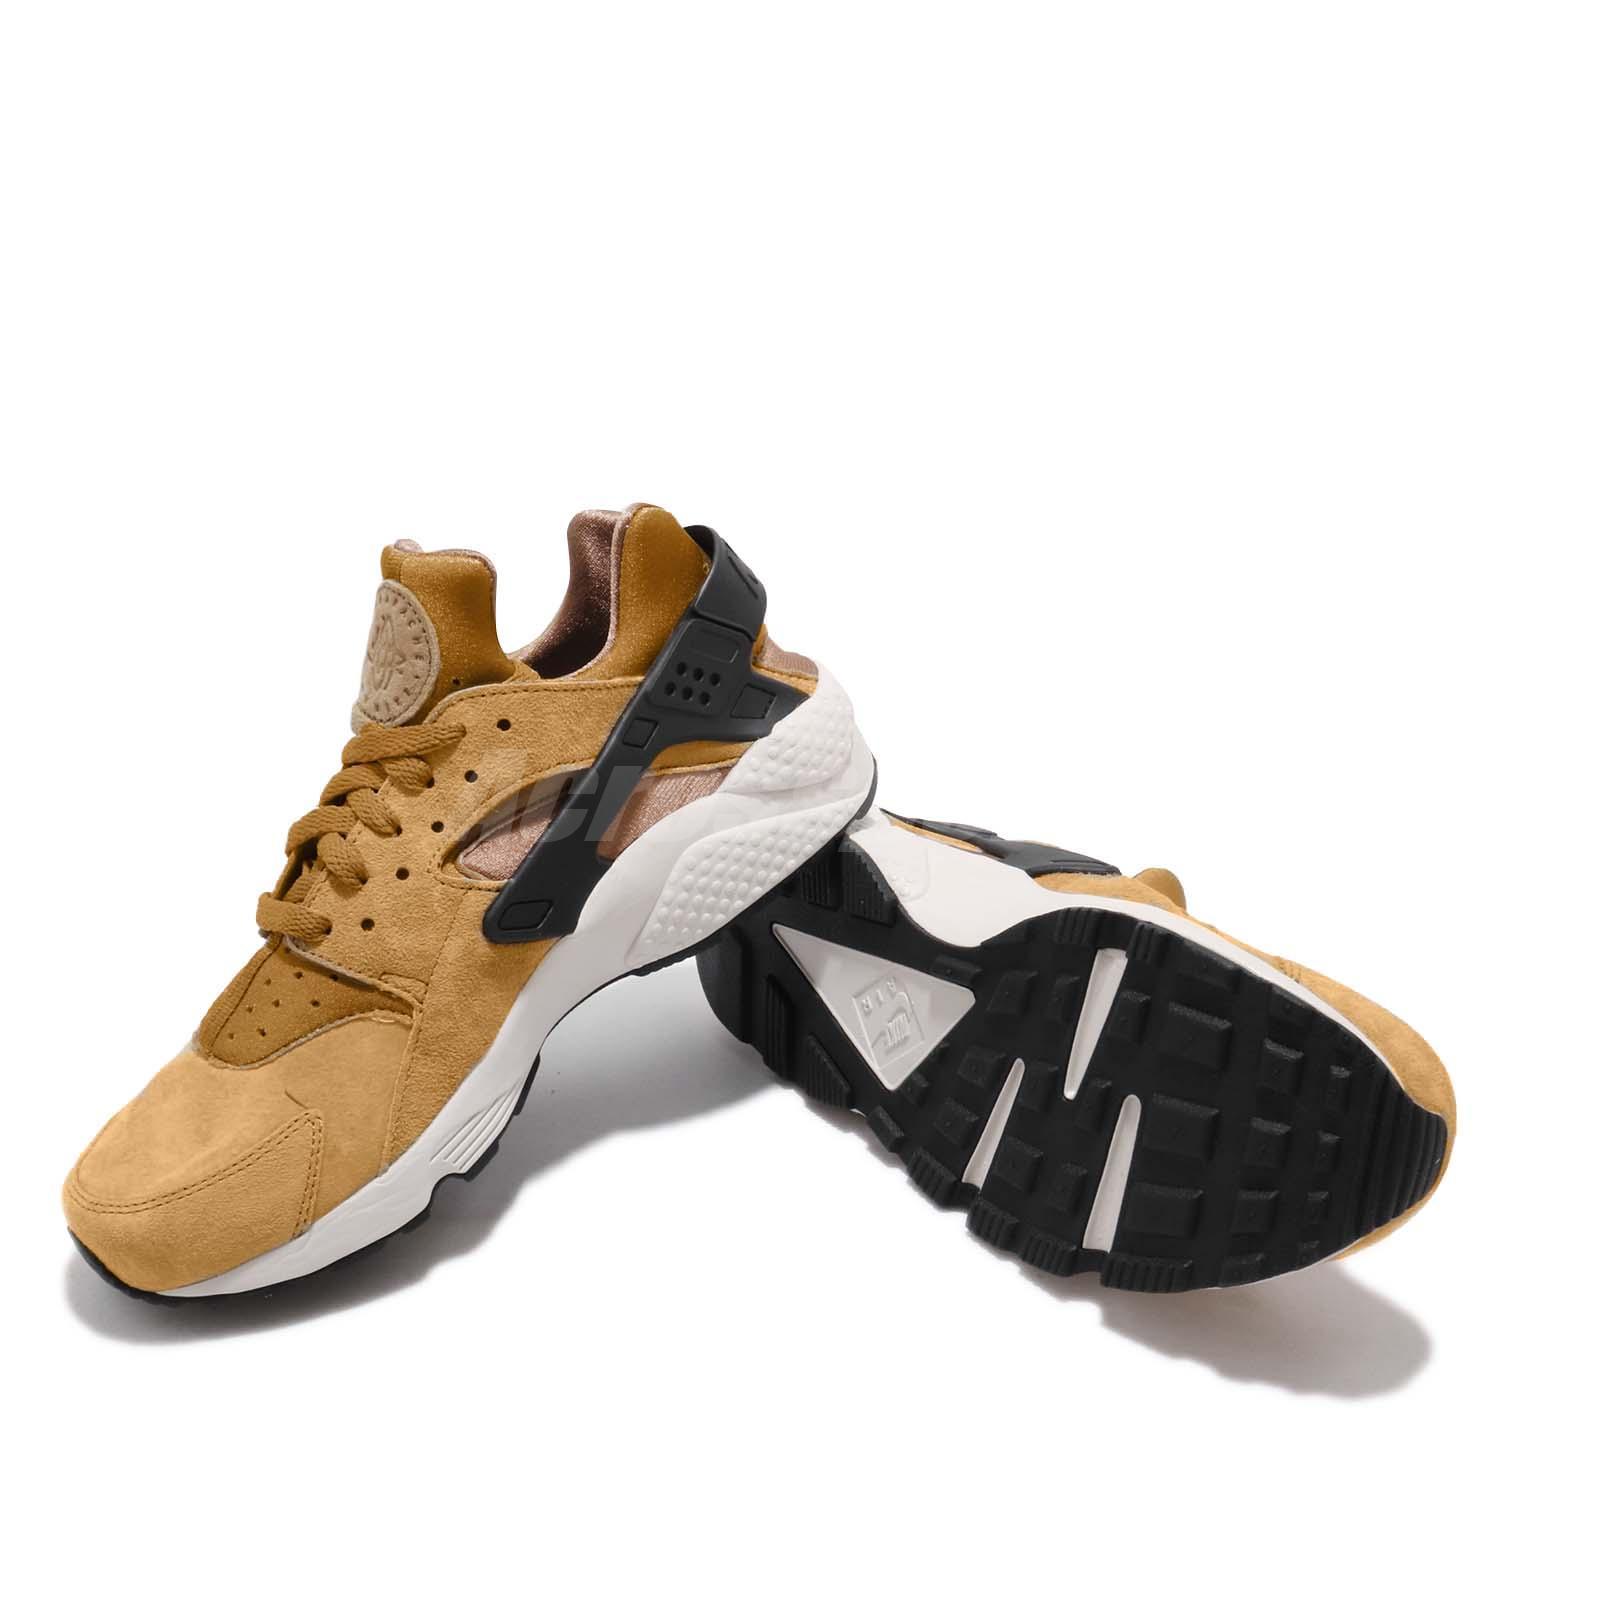 b1922b8d48fe Nike Air Huarache Run PRM Wheat Pack Black Light Bone Men Shoes ...